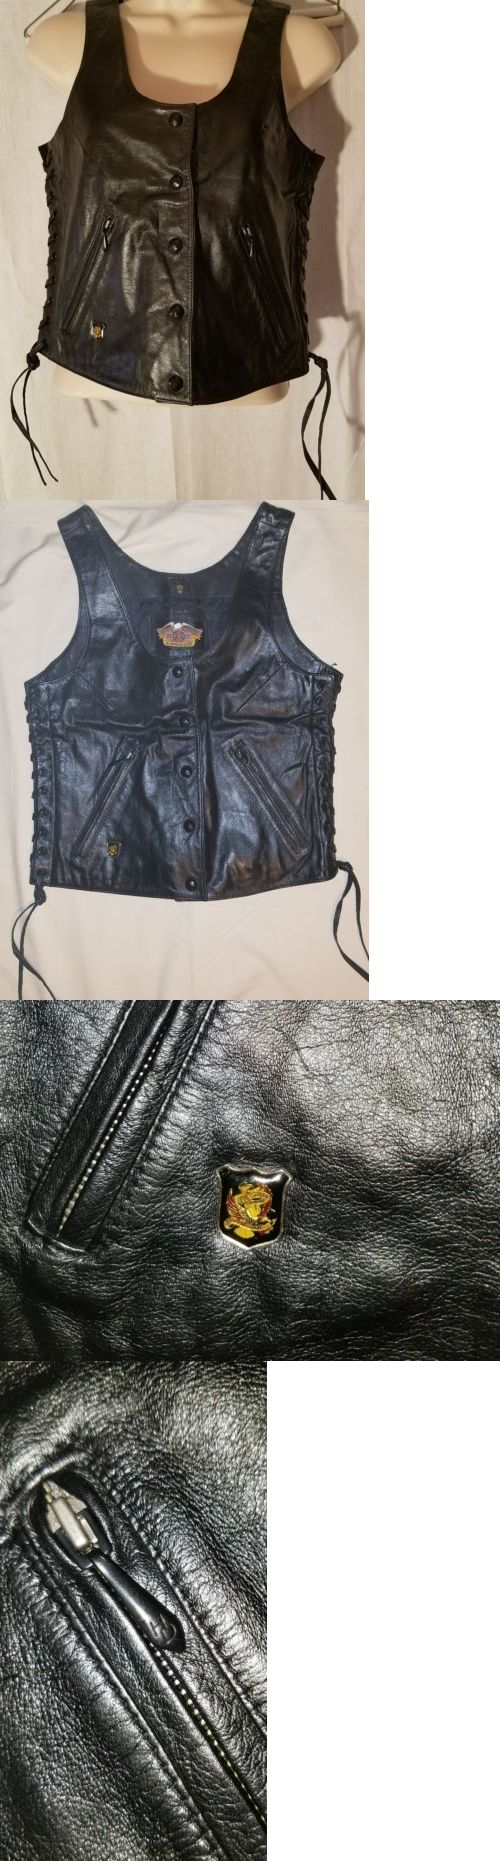 Vests 15775: Harley Davidson Leather Vest Womens Size Xs Lace Up Sides Black -> BUY IT NOW ONLY: $45.99 on eBay!